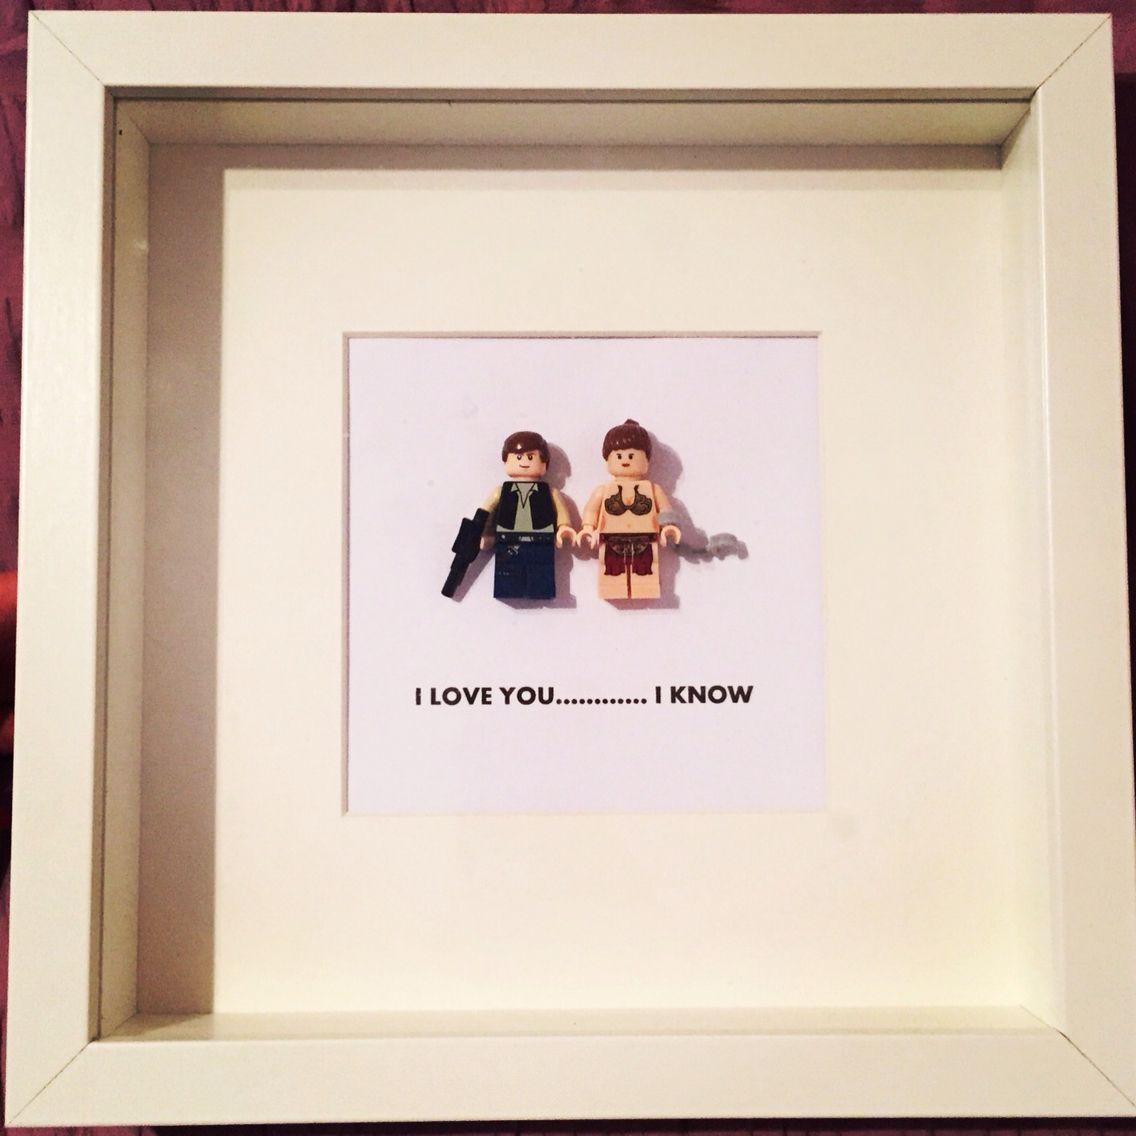 I love you.... I know Star Wars lego frame | Luma Gifts | Pinterest